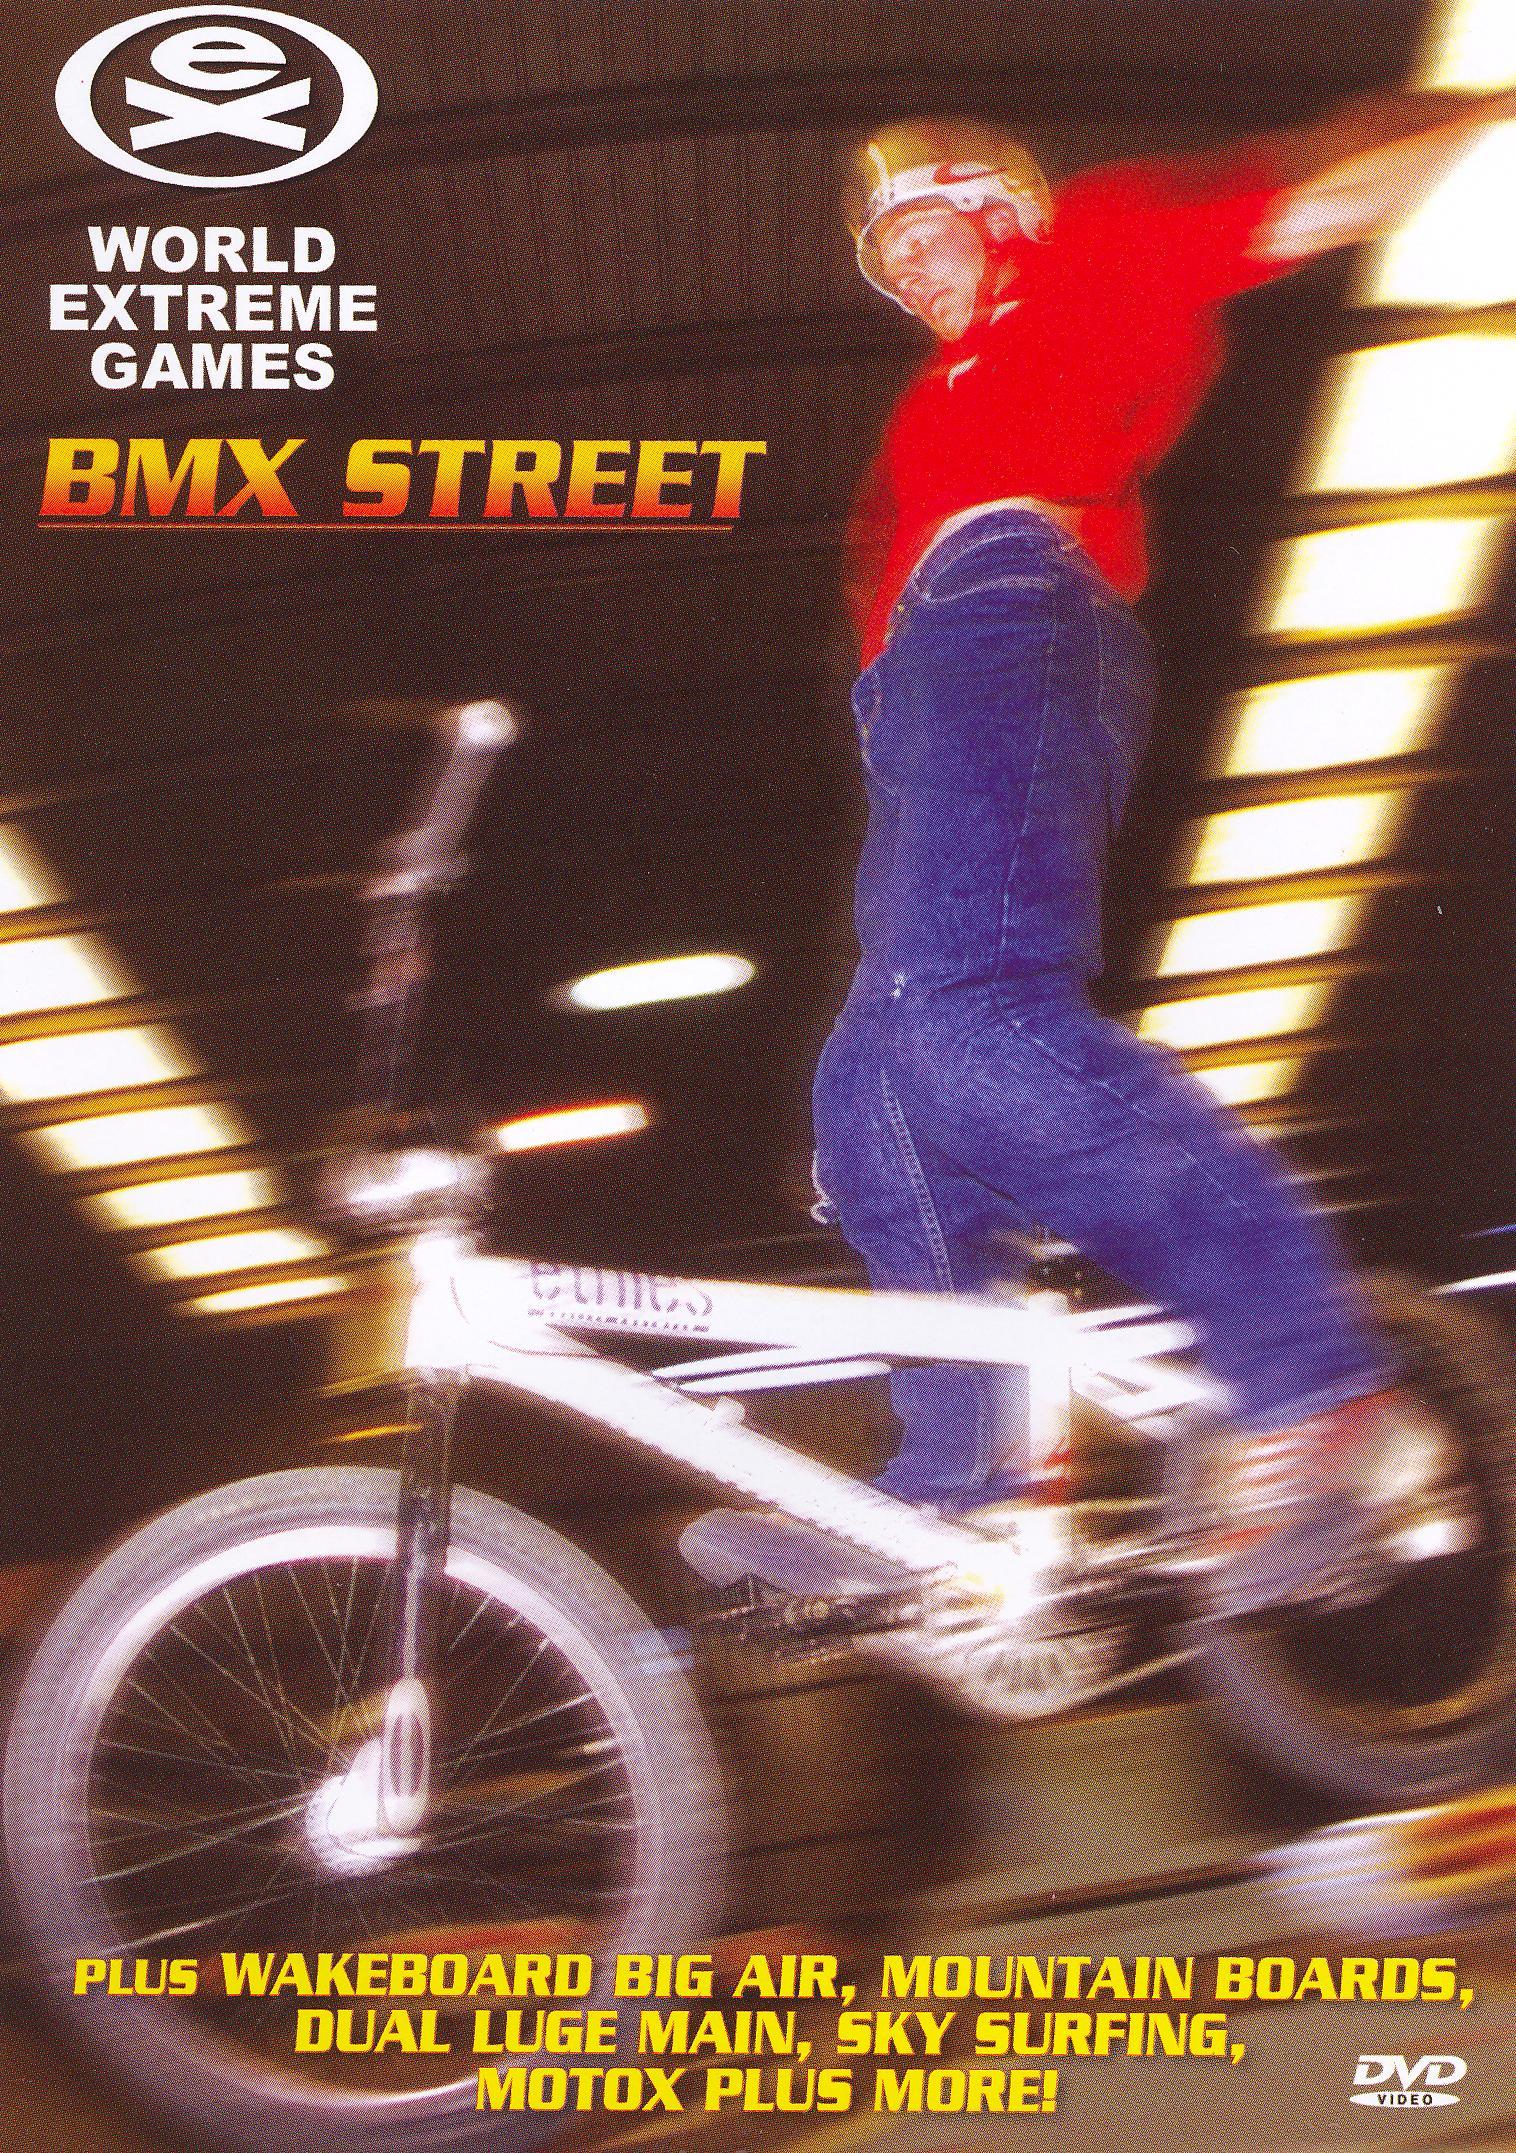 World Extreme Games, Vol. 1